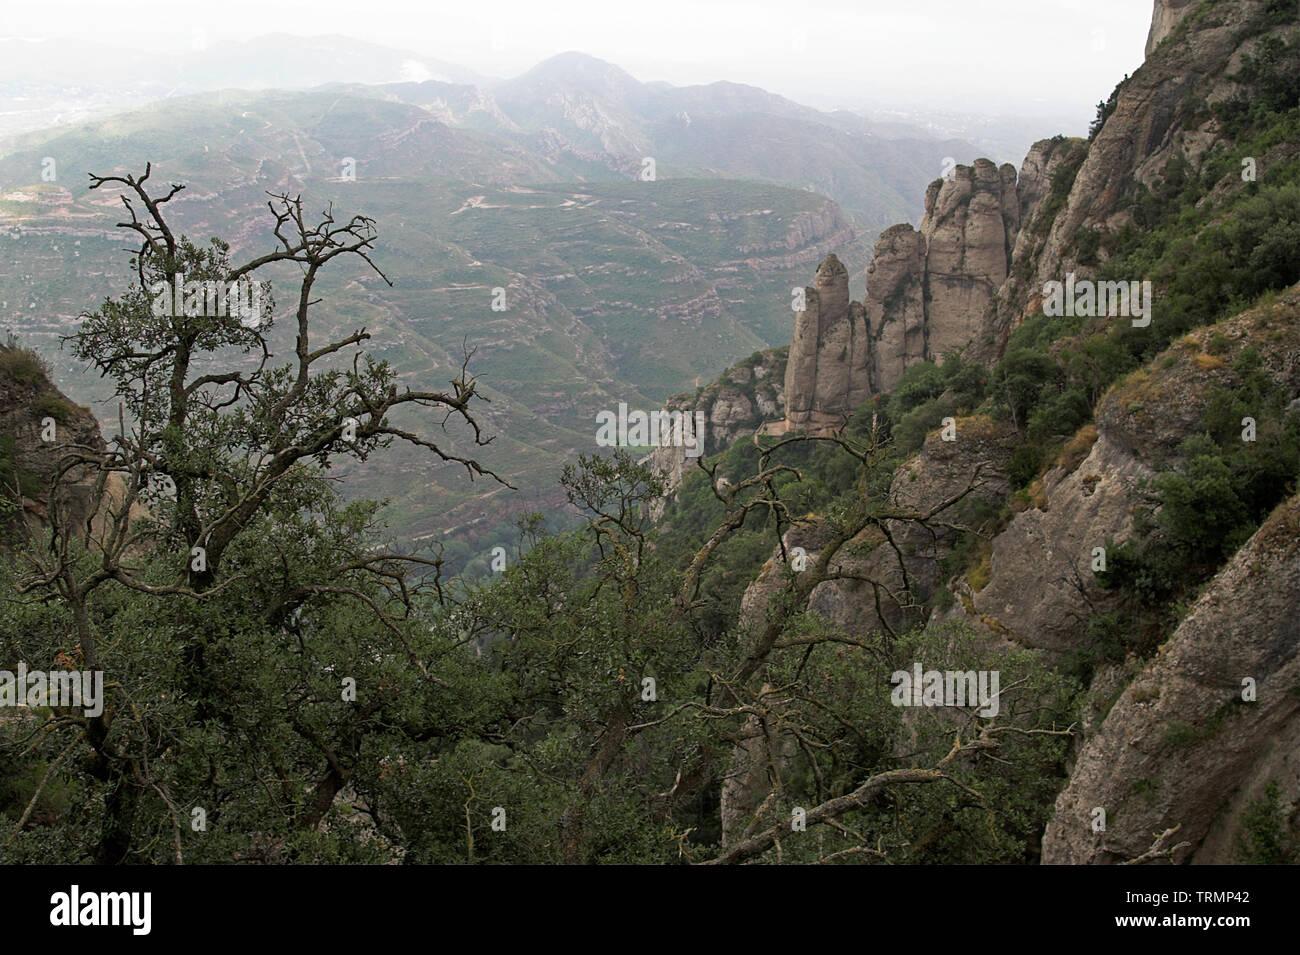 Rocks and hills near Montserrat, Catalonia, Spain. Felsen und Hügel nahe Montserrat, Katalonien, Spanien. Skały i wzgórza w okolicy Montserrat. - Stock Image